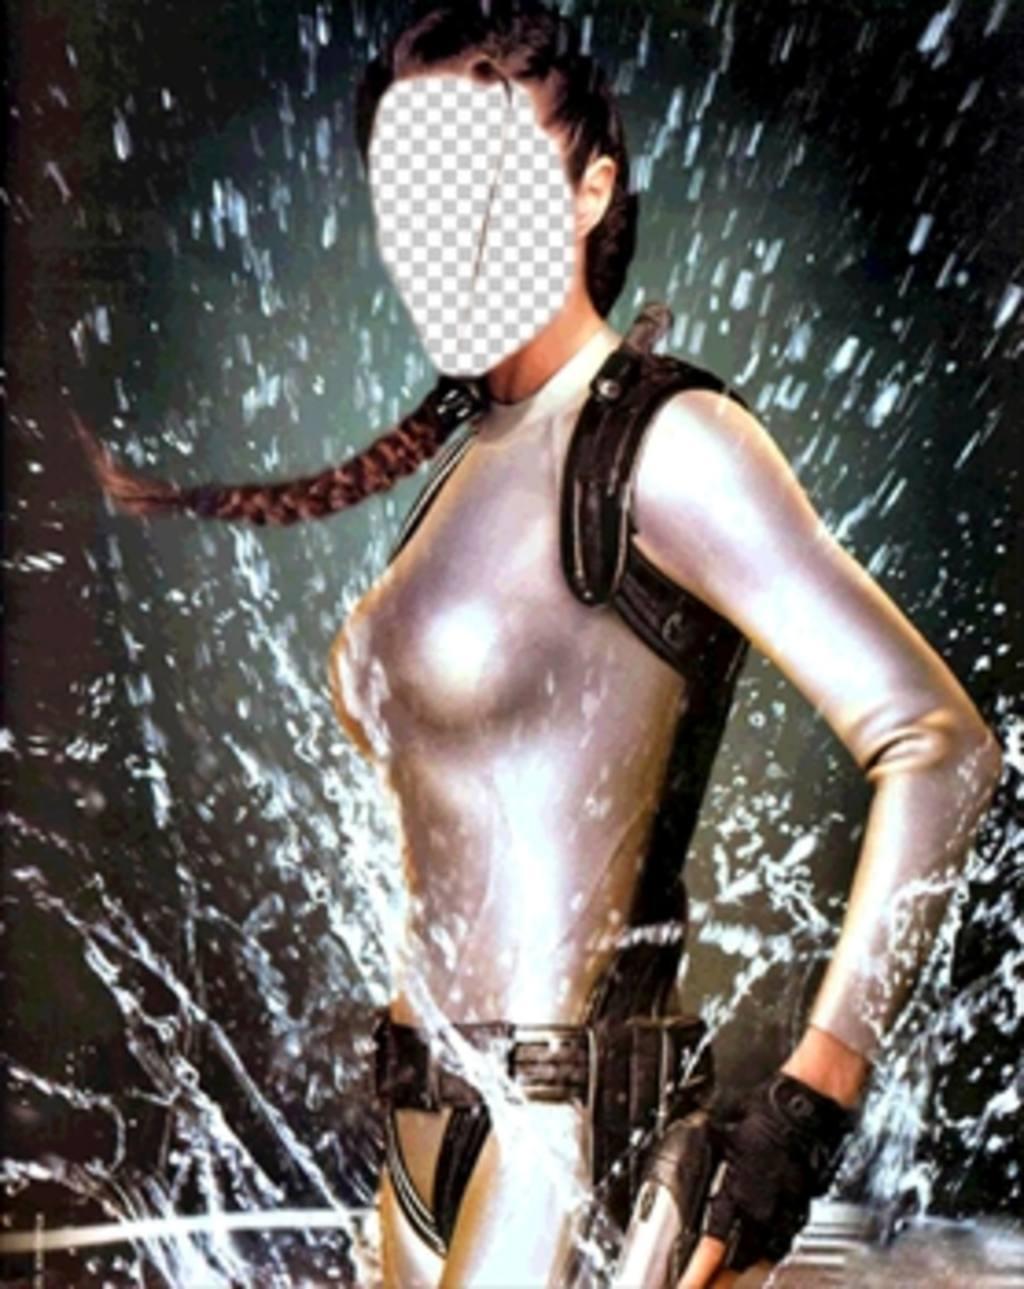 Conviértete en la aventurera Lara Croft con este montaje para editar